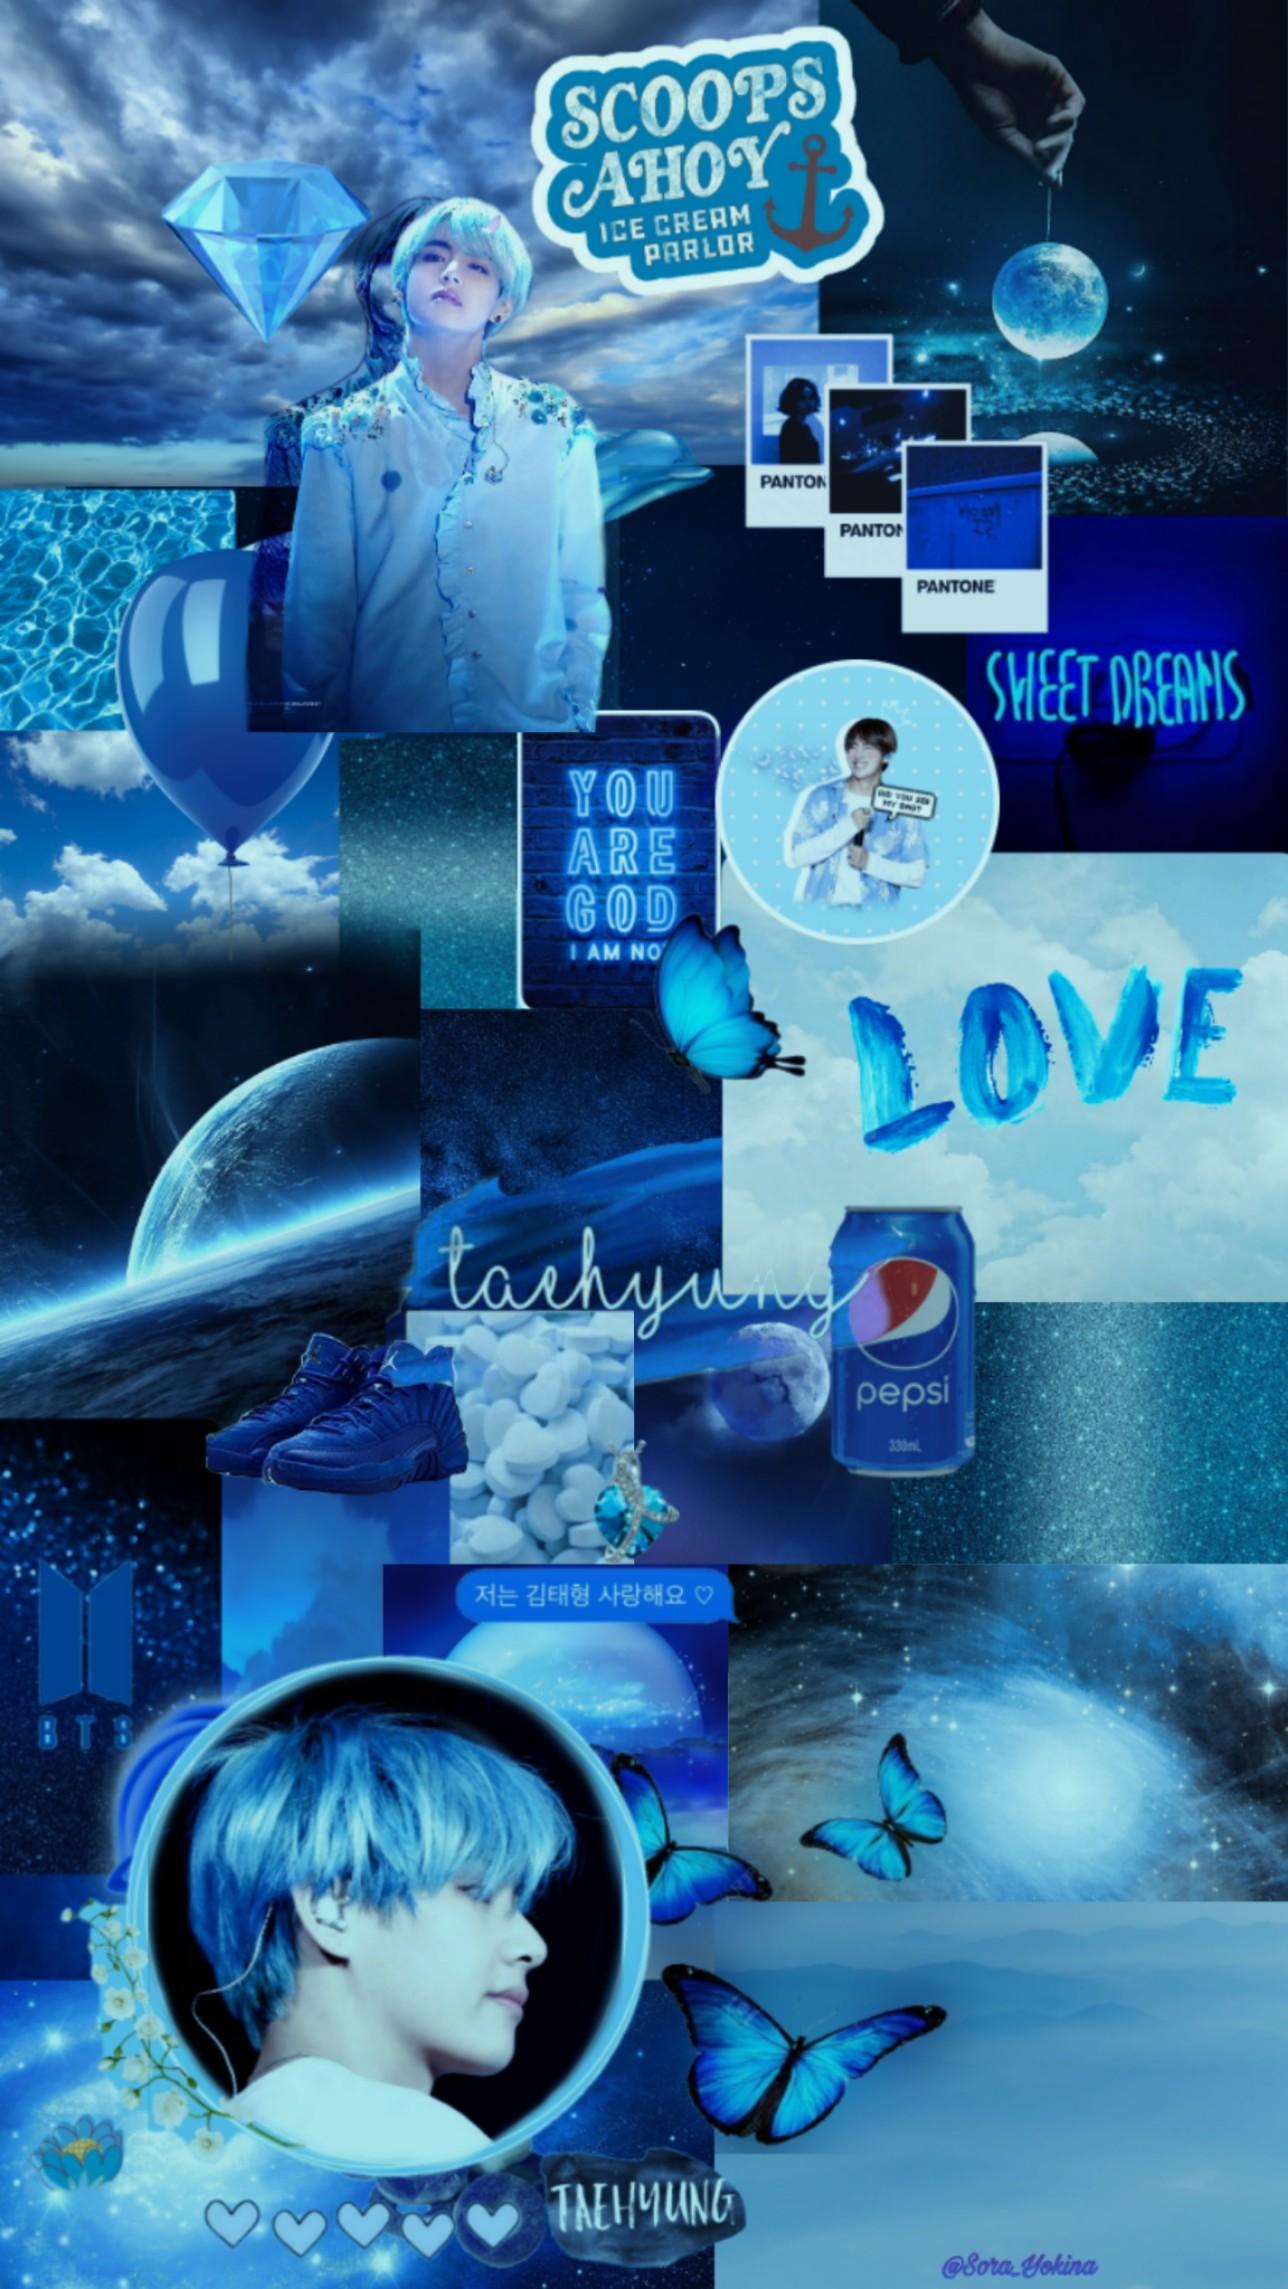 Bts Kim Taehyung Aesthetic Blue Wallpaper By Kotorimarie On